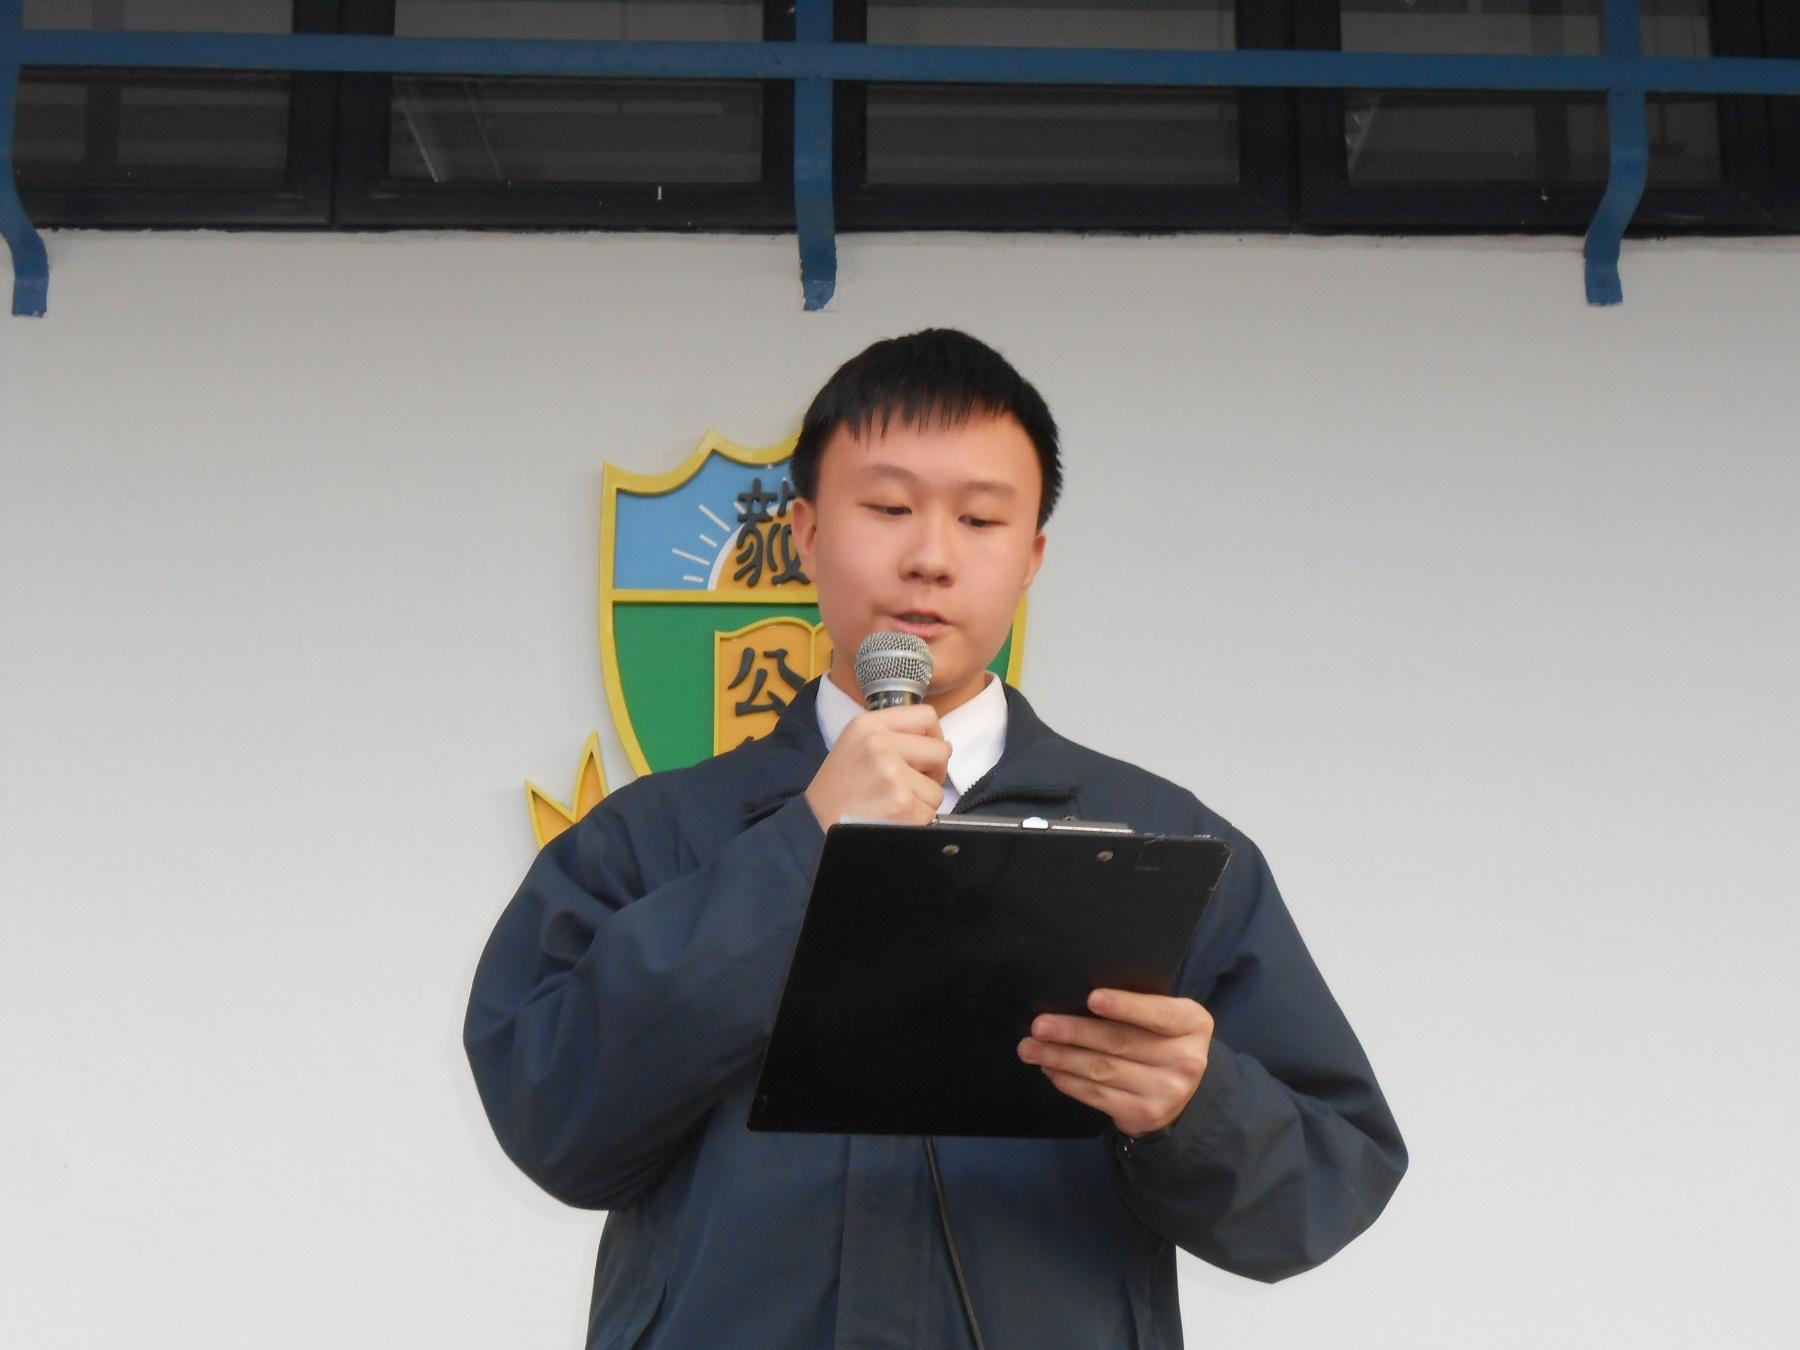 http://npc.edu.hk/sites/default/files/dscn9783.jpg